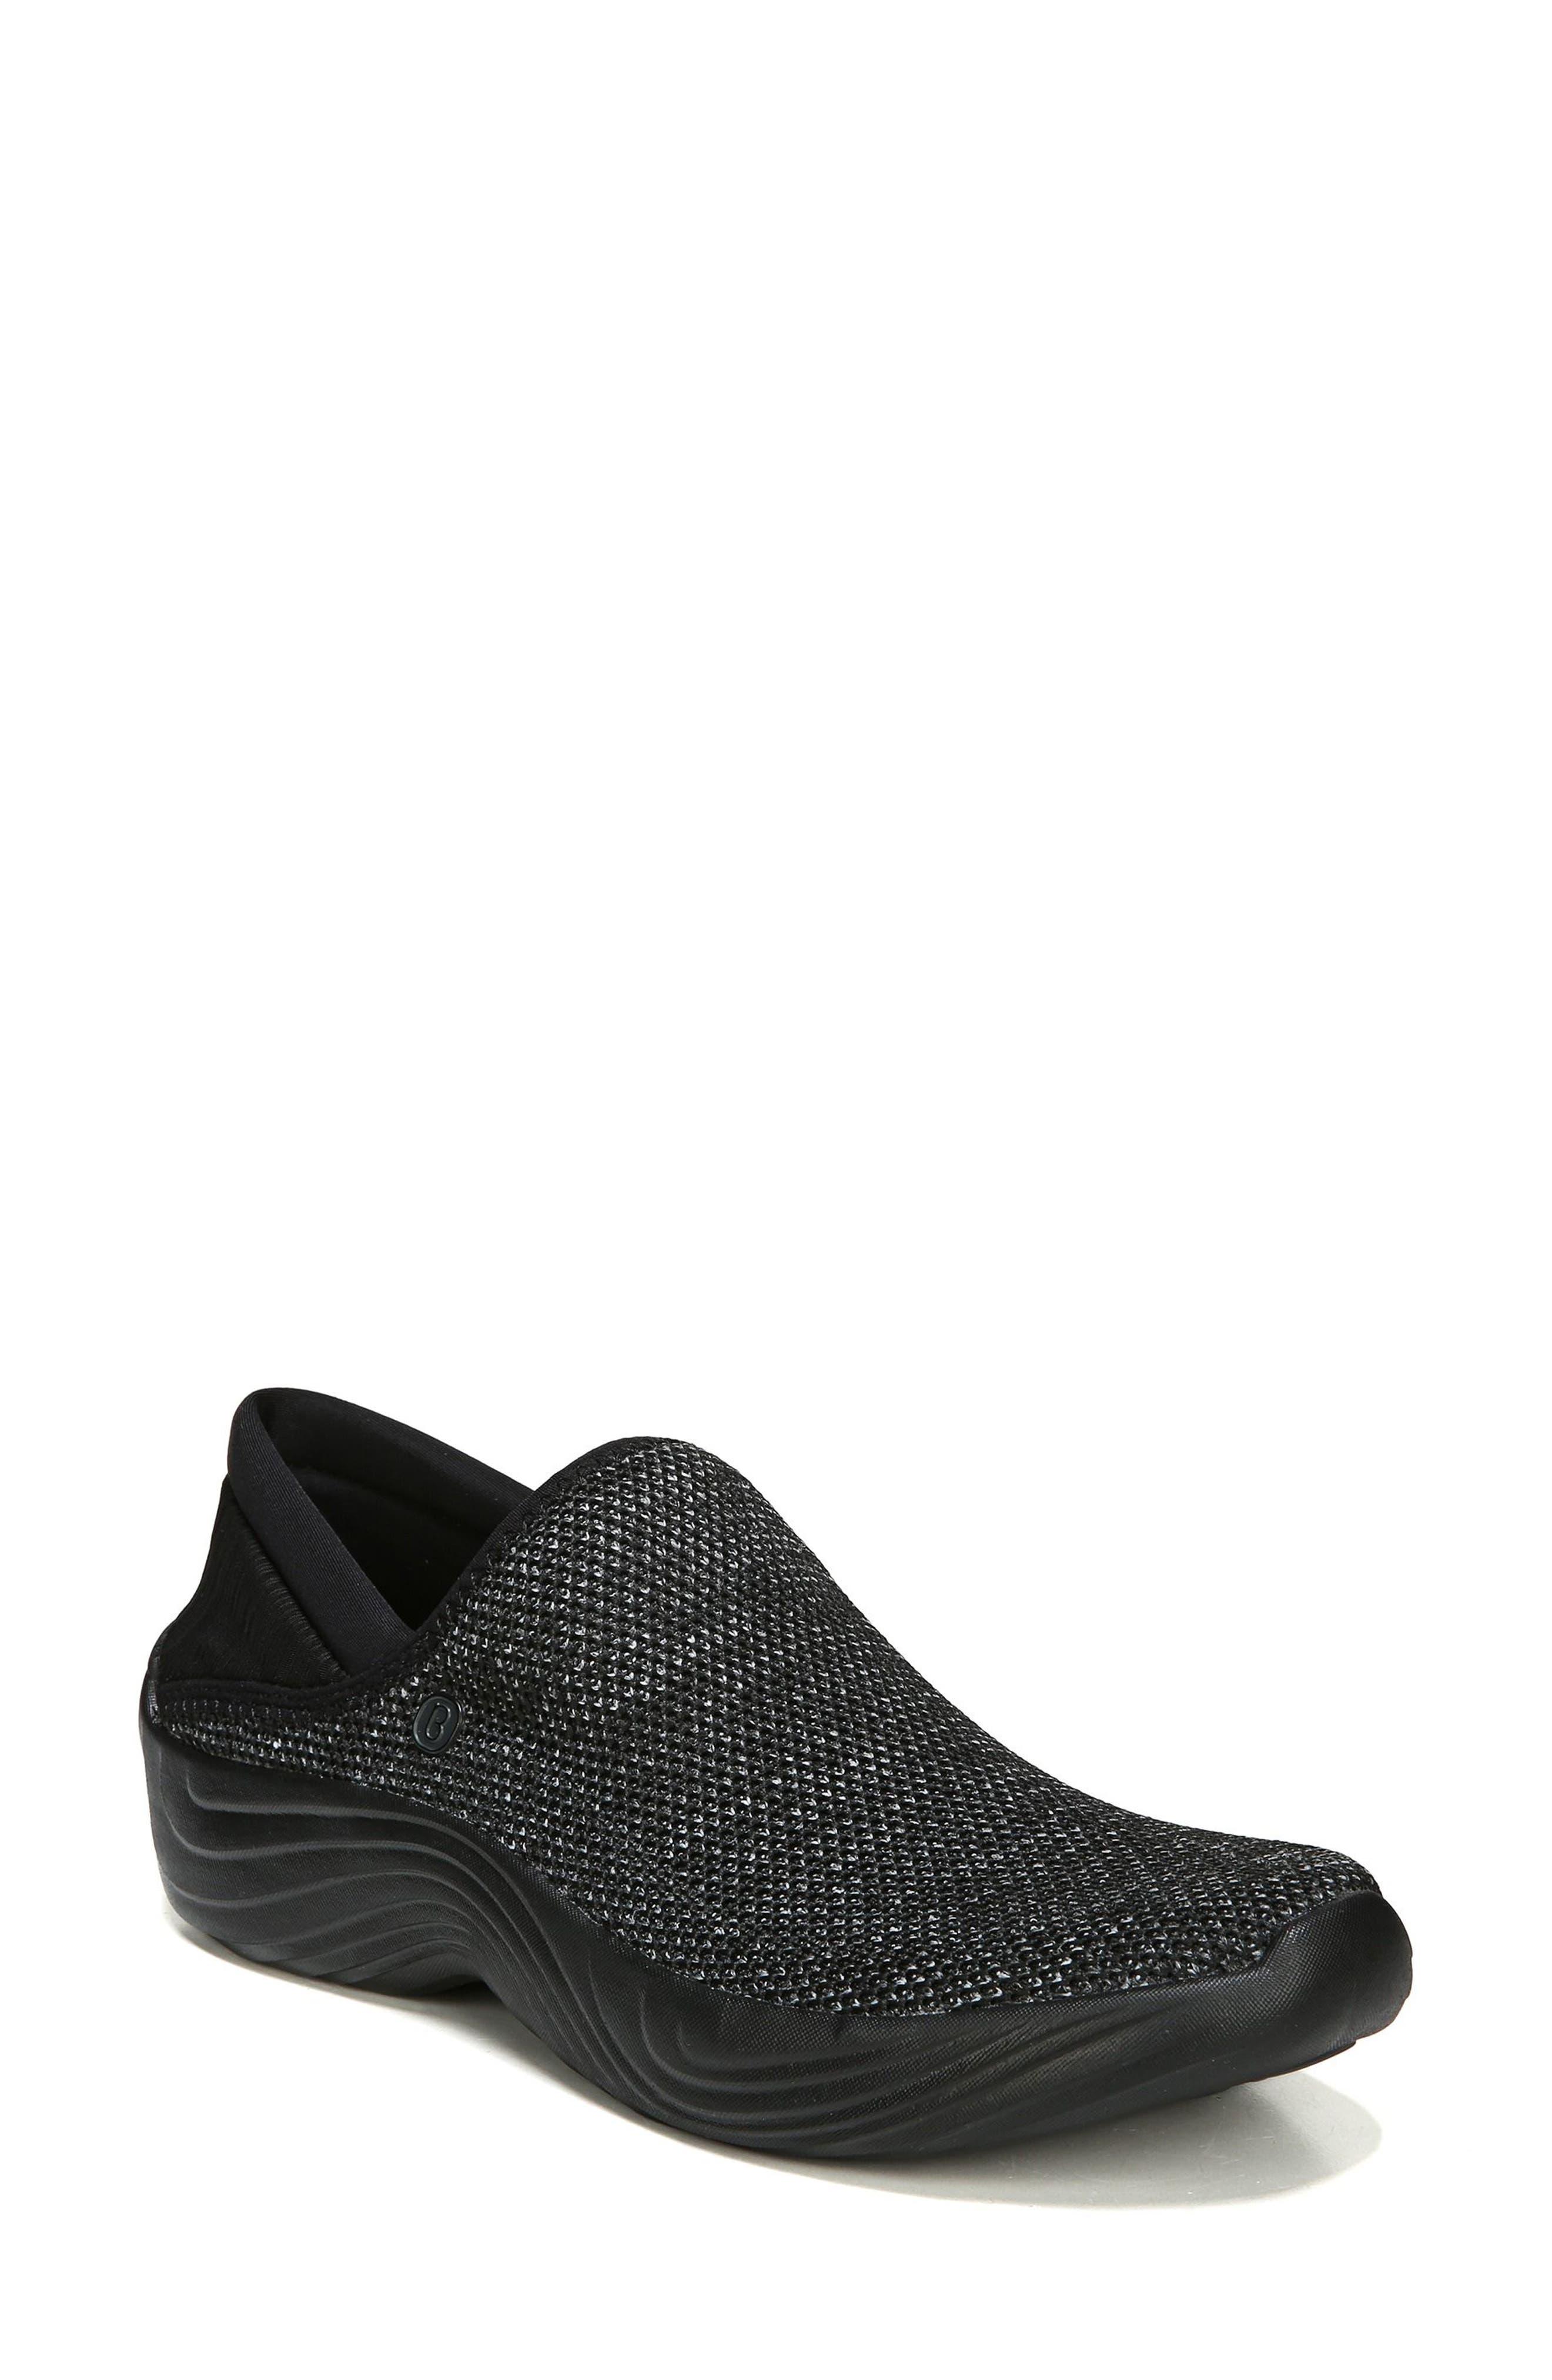 Topaz Slip-On Sneaker,                             Main thumbnail 1, color,                             BLACK FABRIC